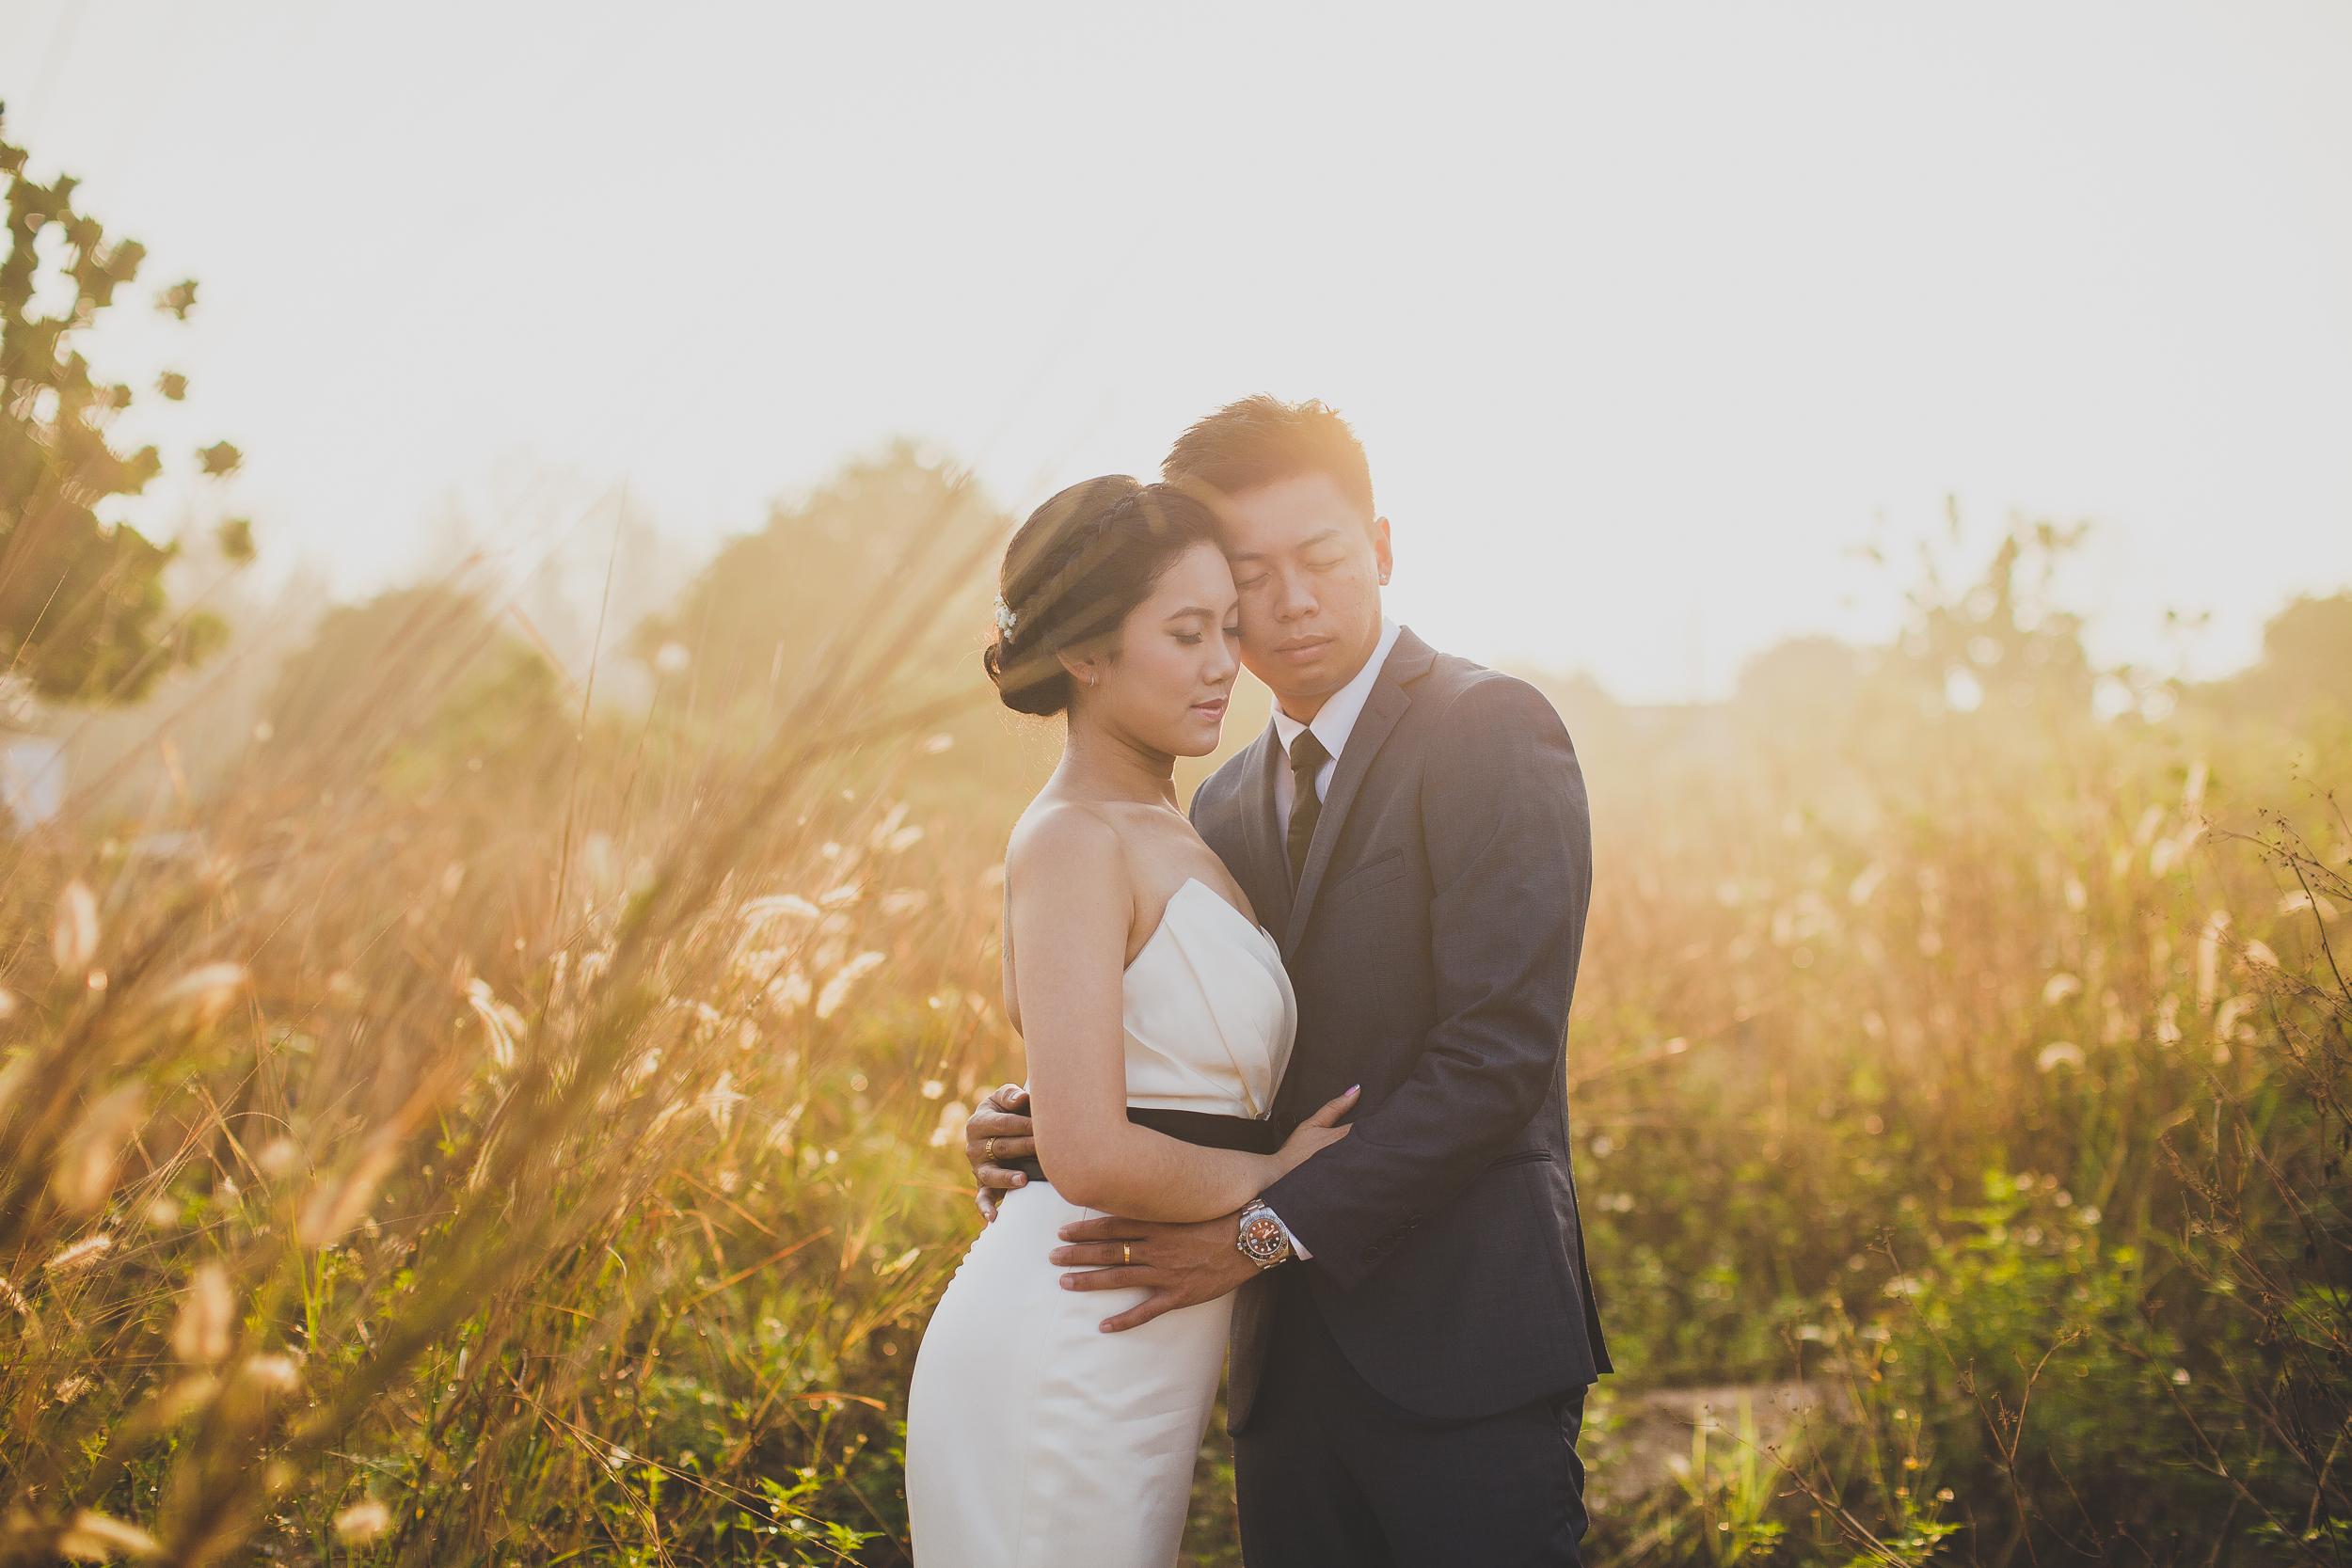 Singapore+Pre+Wedding+Photographer+Ziyang+Clara-0002.jpg